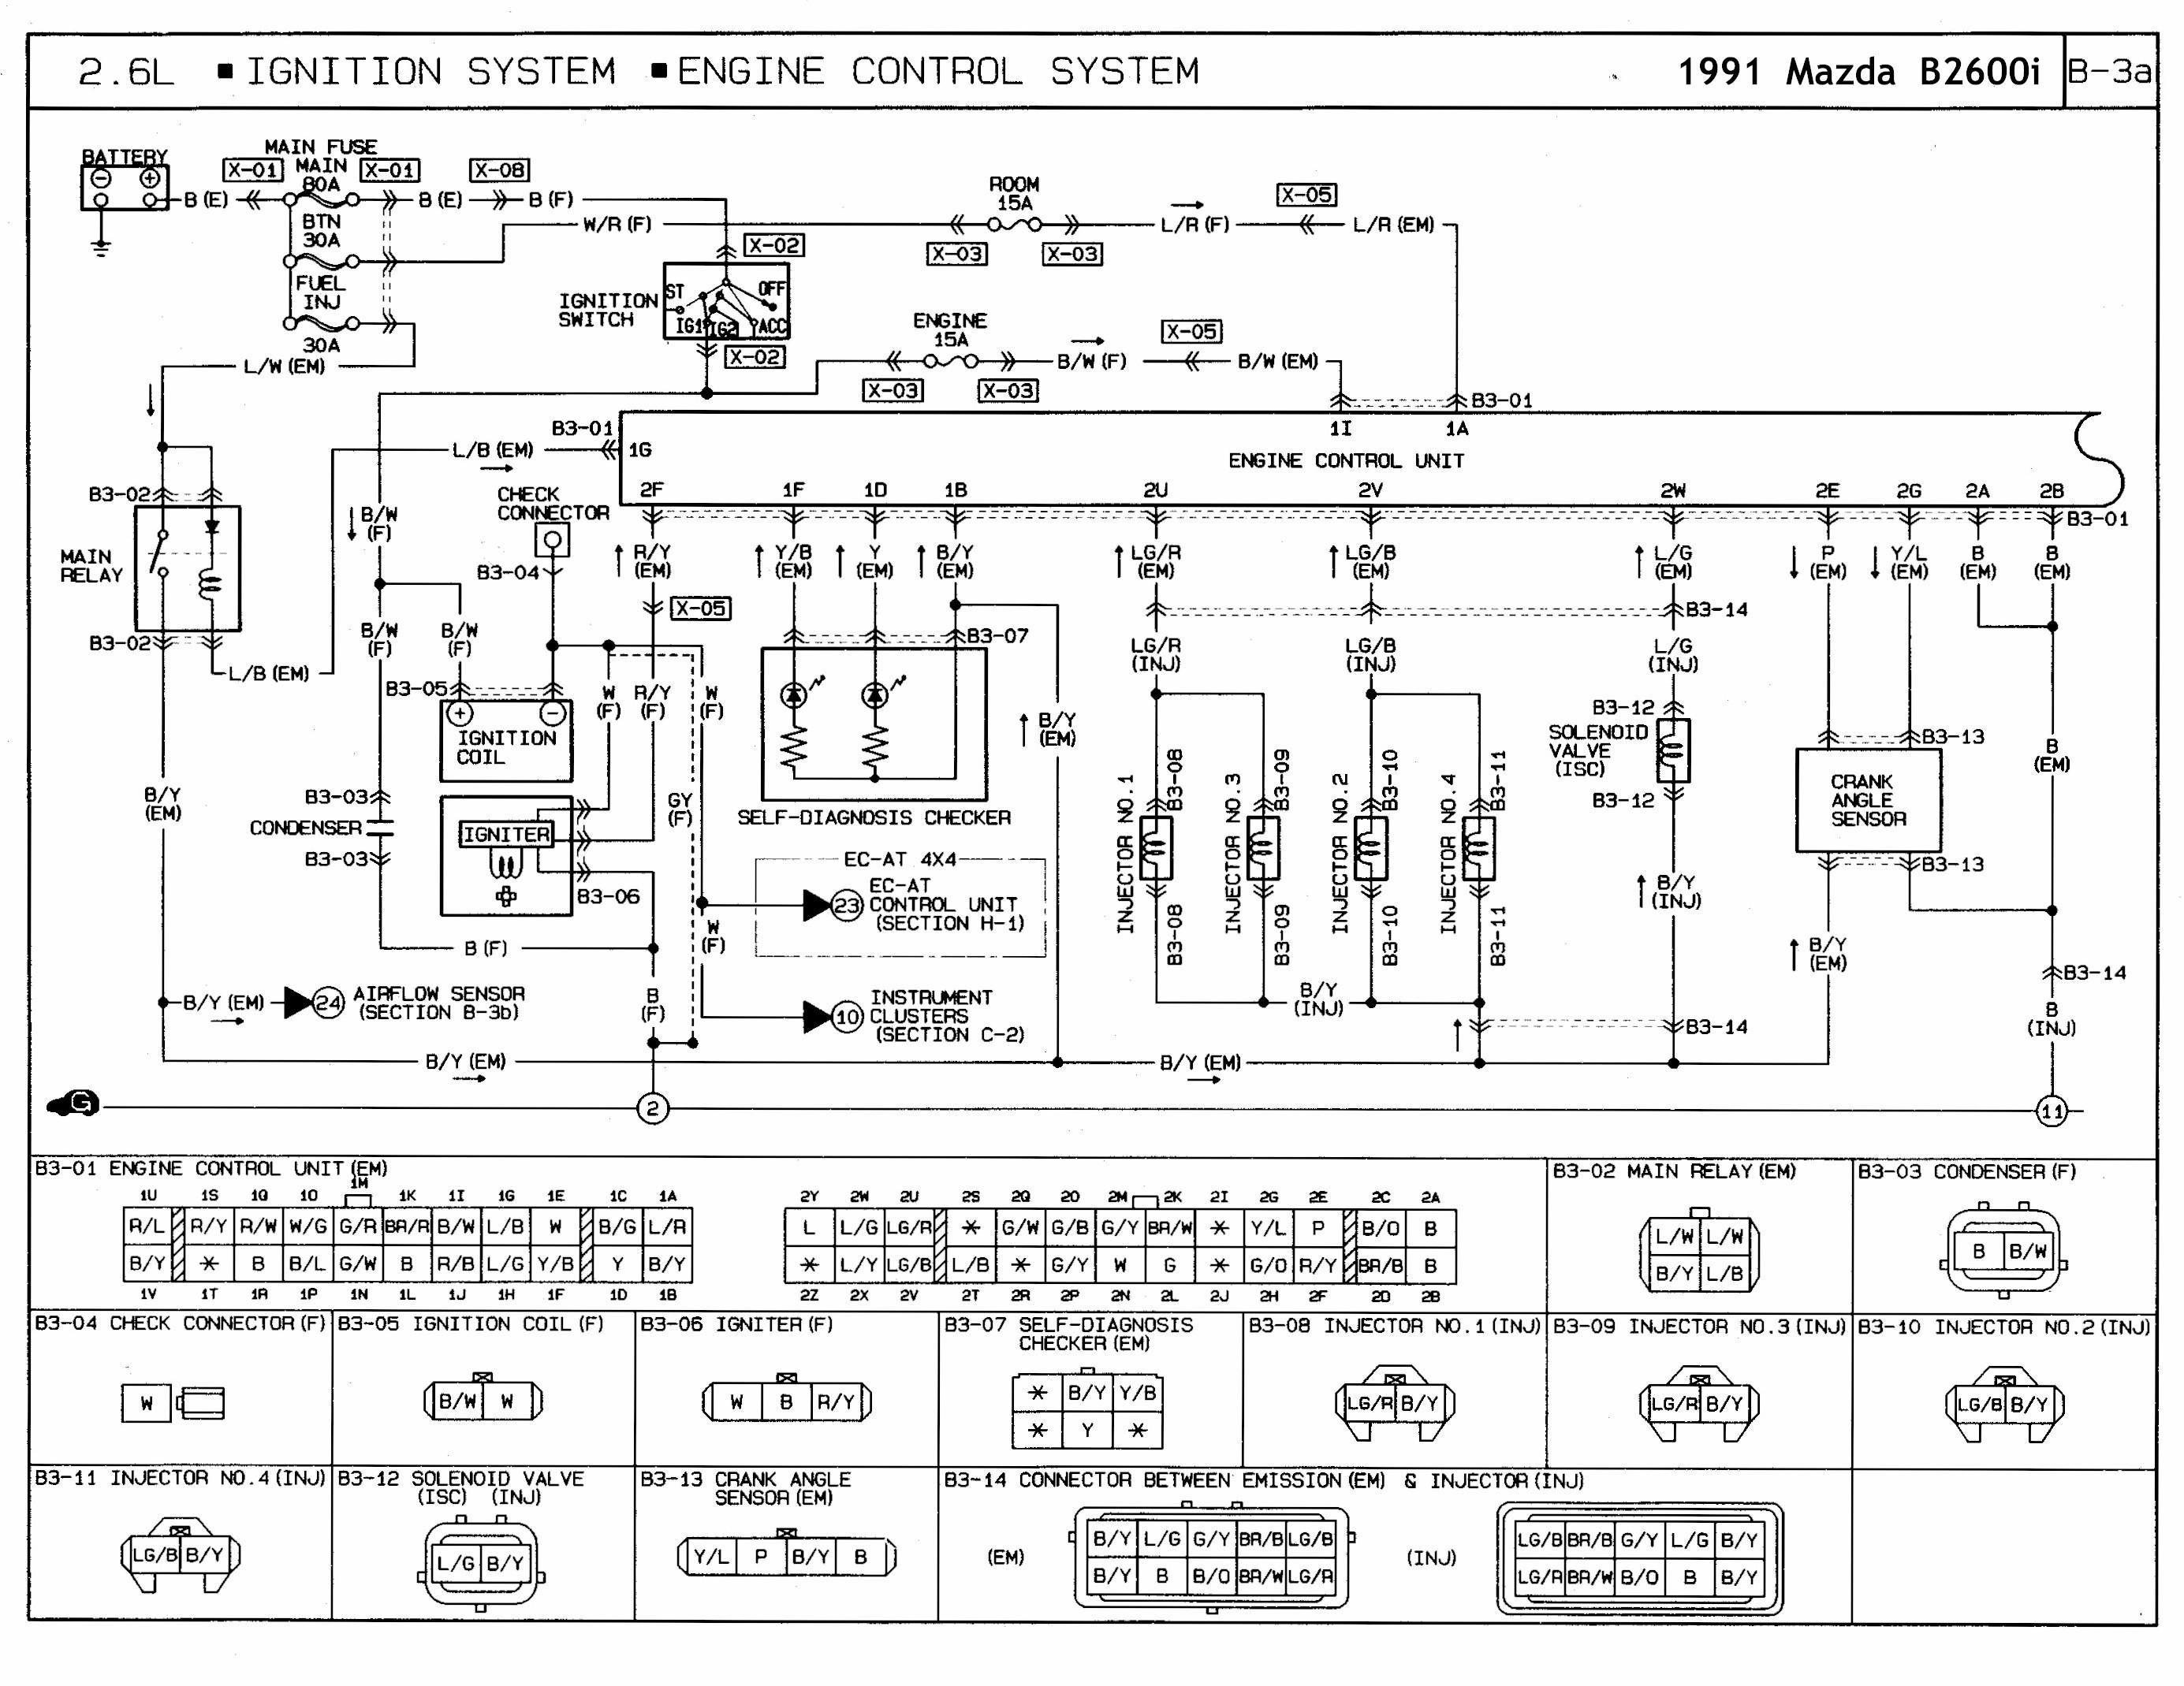 mazda 626 distributor wiring diagram as 0810  mazda miata wiring diagram electrical schematics and  mazda miata wiring diagram electrical